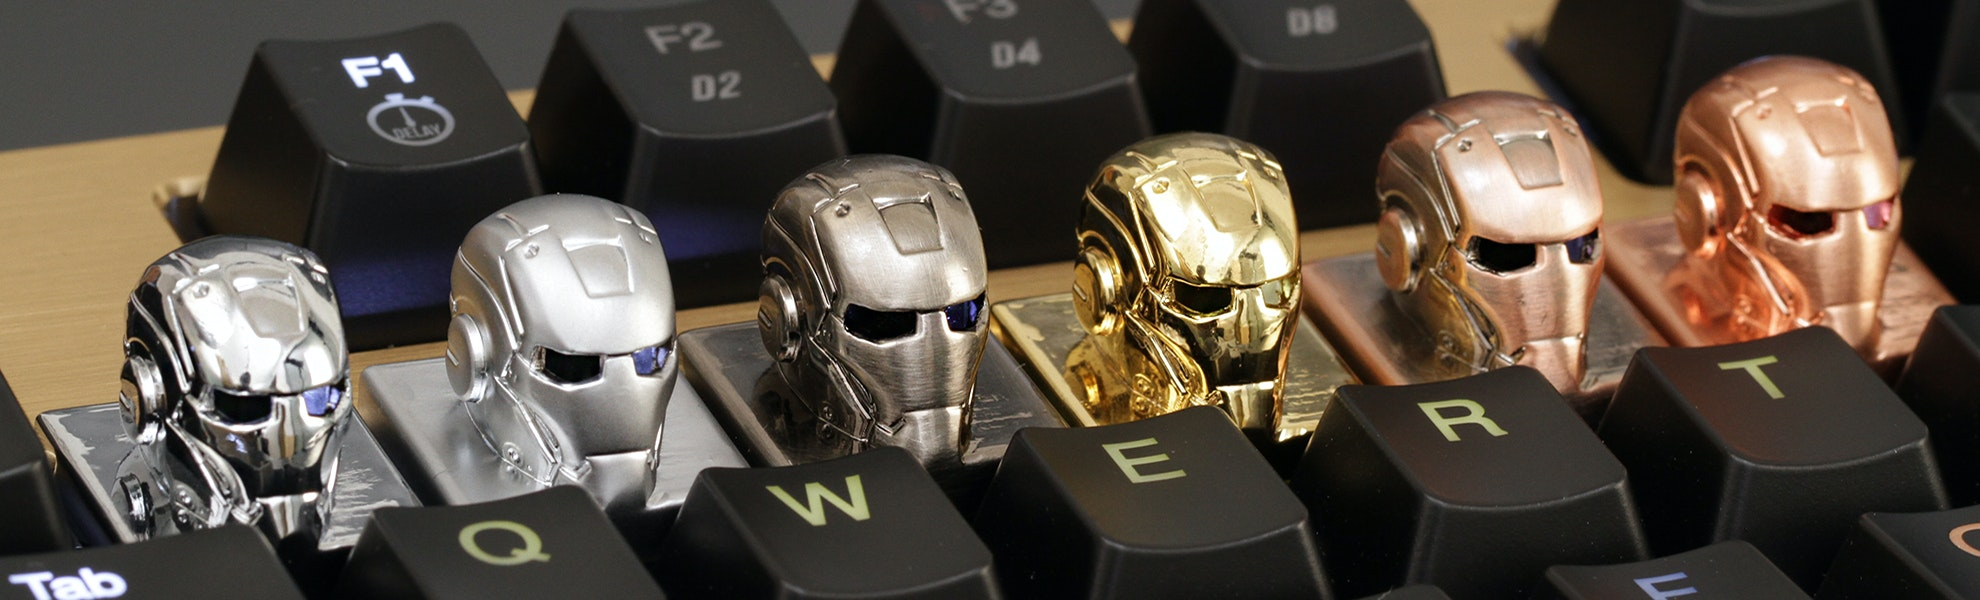 GeekKeys Metal Ironman Cherry MX Keycap